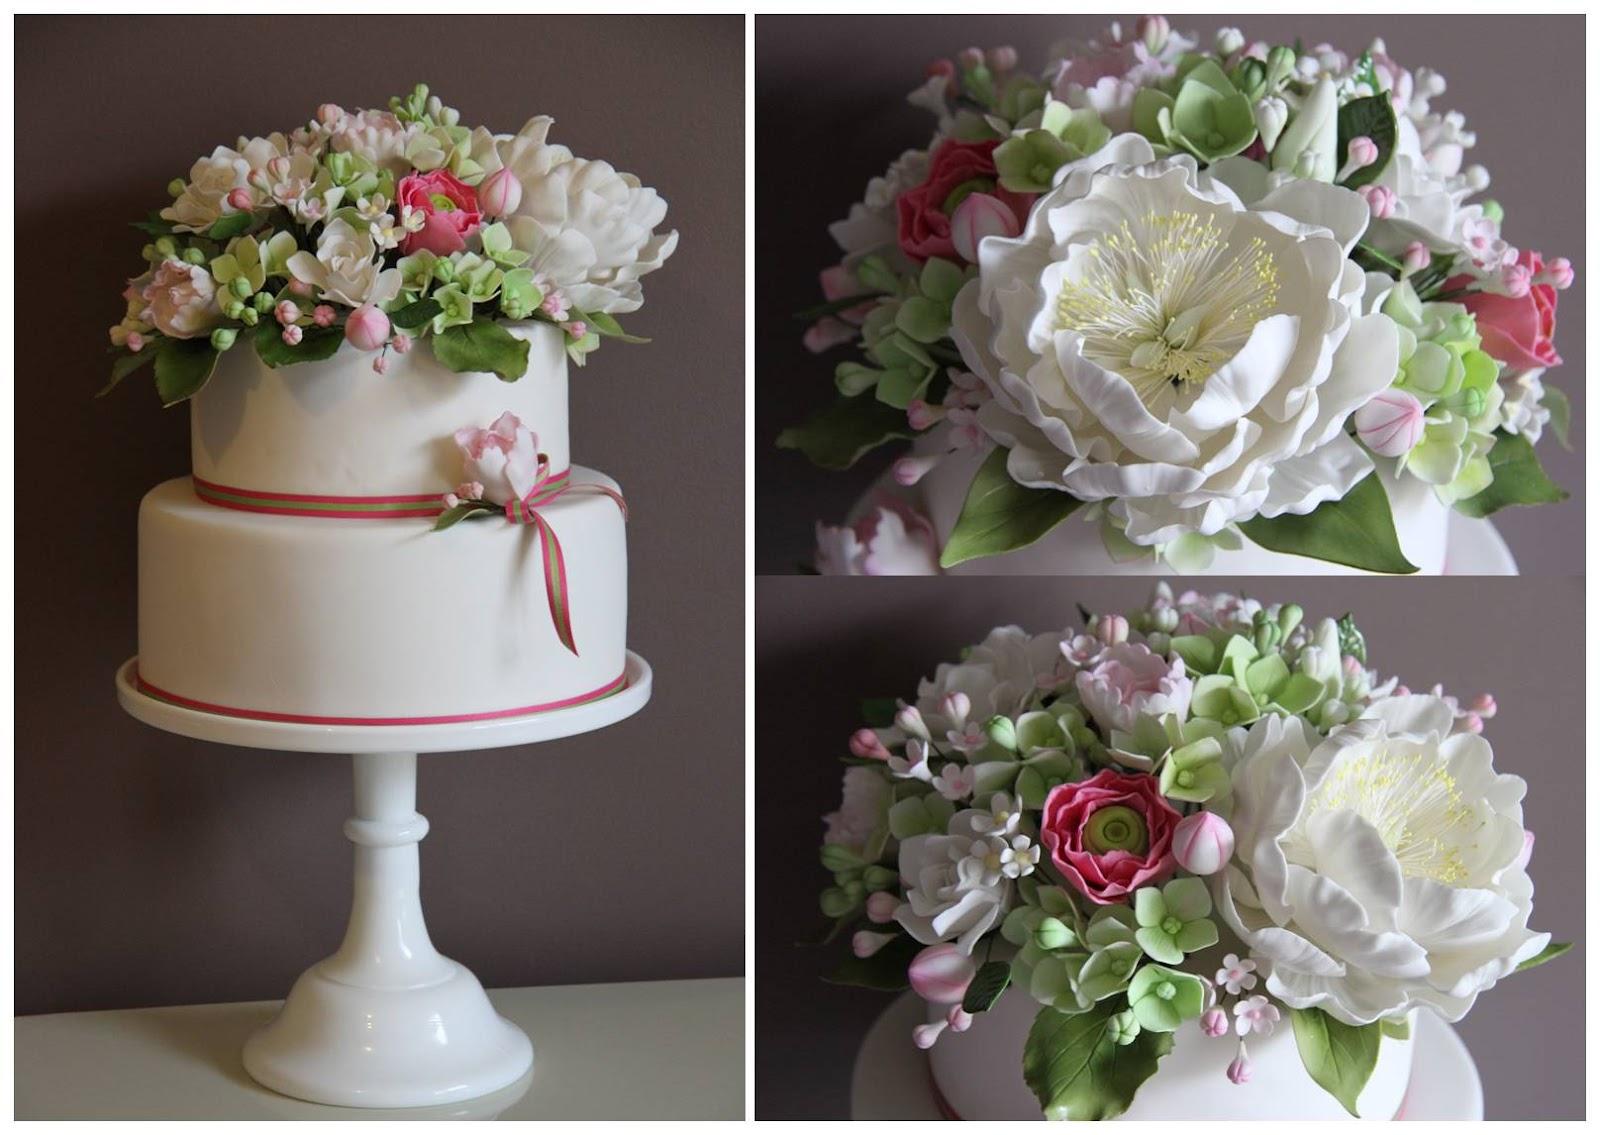 Leonies cakes and parties 80th birthday cake my nannas 80th birthday cake izmirmasajfo